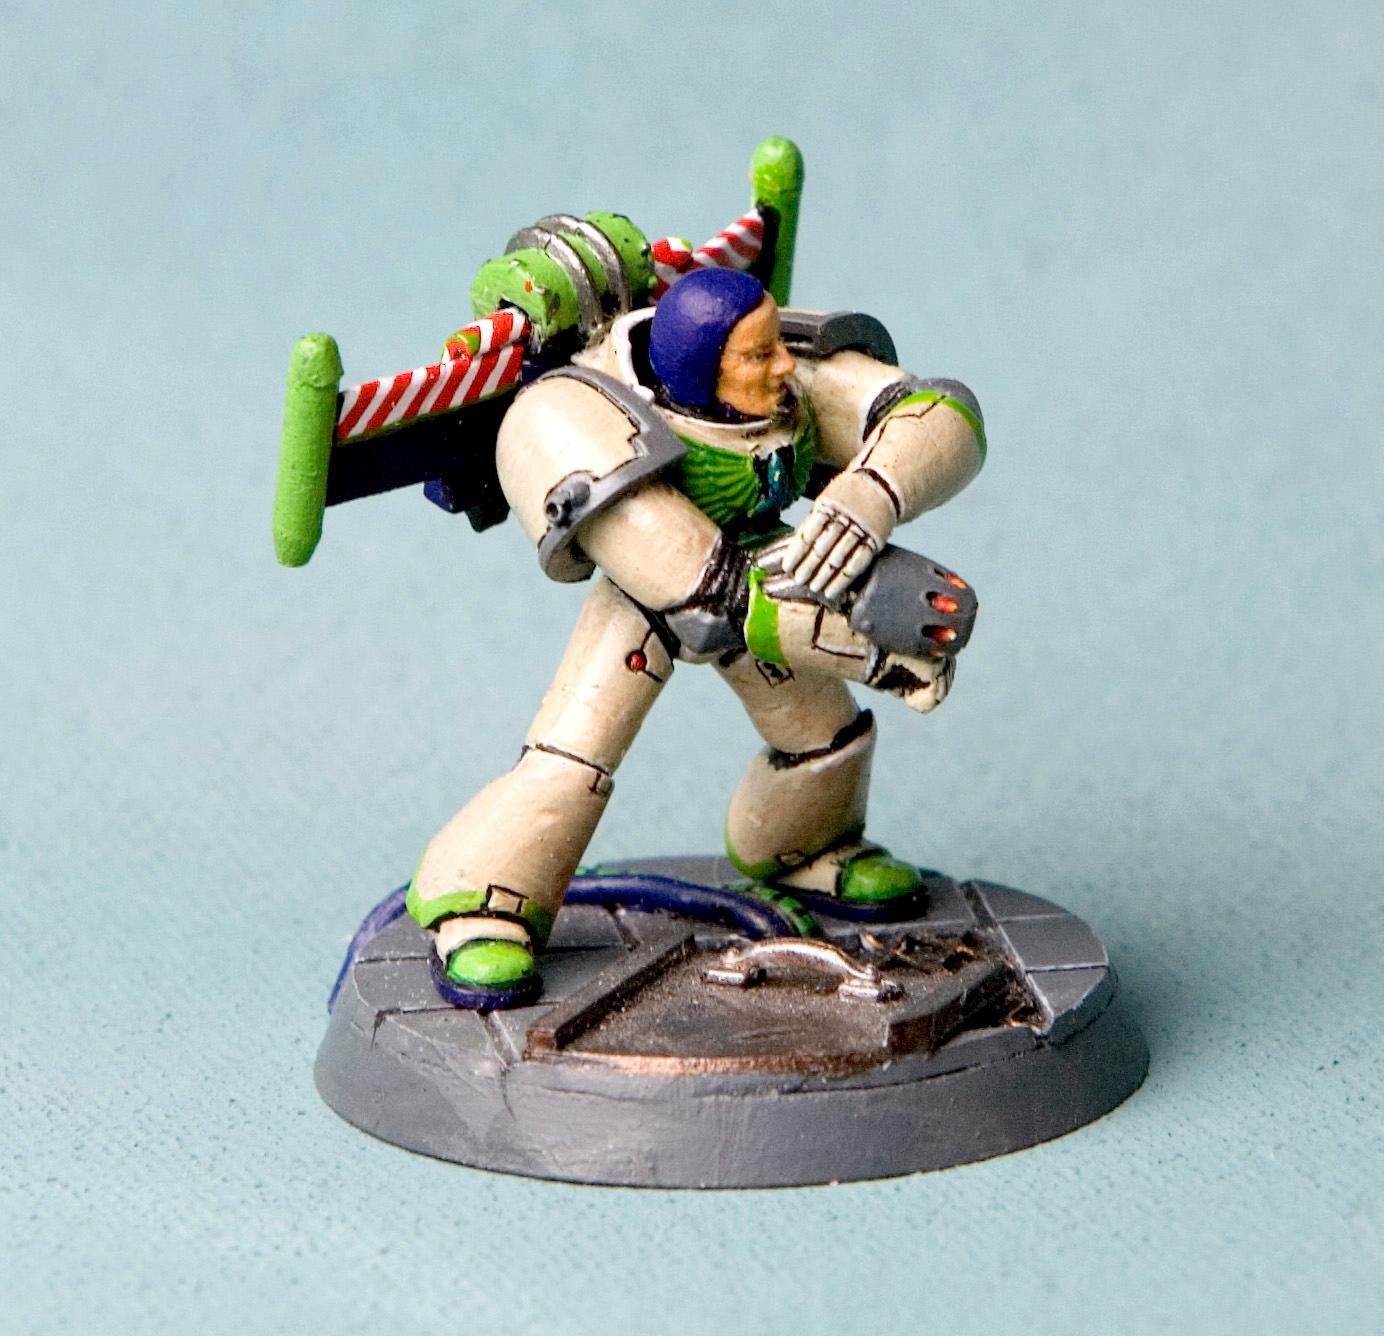 Buzz, Buzz Lightyear, Conversion, Cool